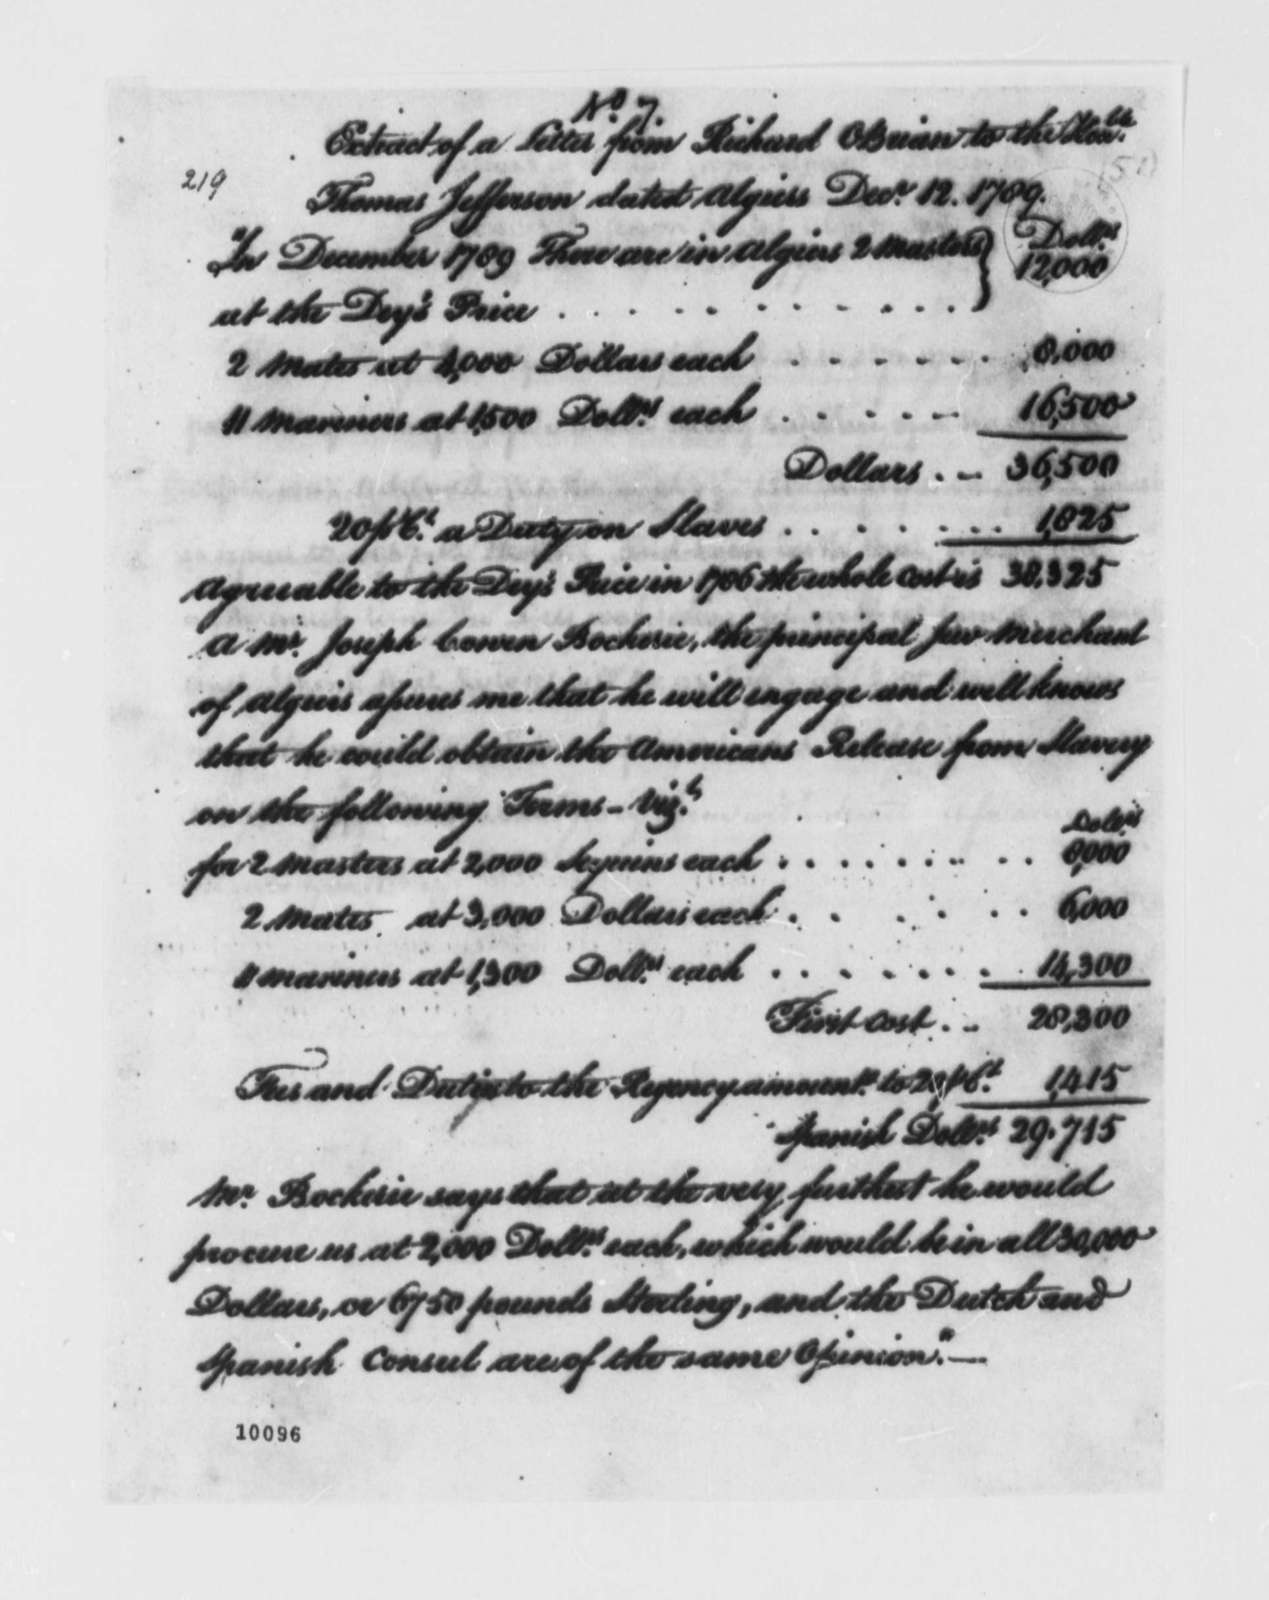 Richard O'Brien to Thomas Jefferson, December 12, 1789, Extract